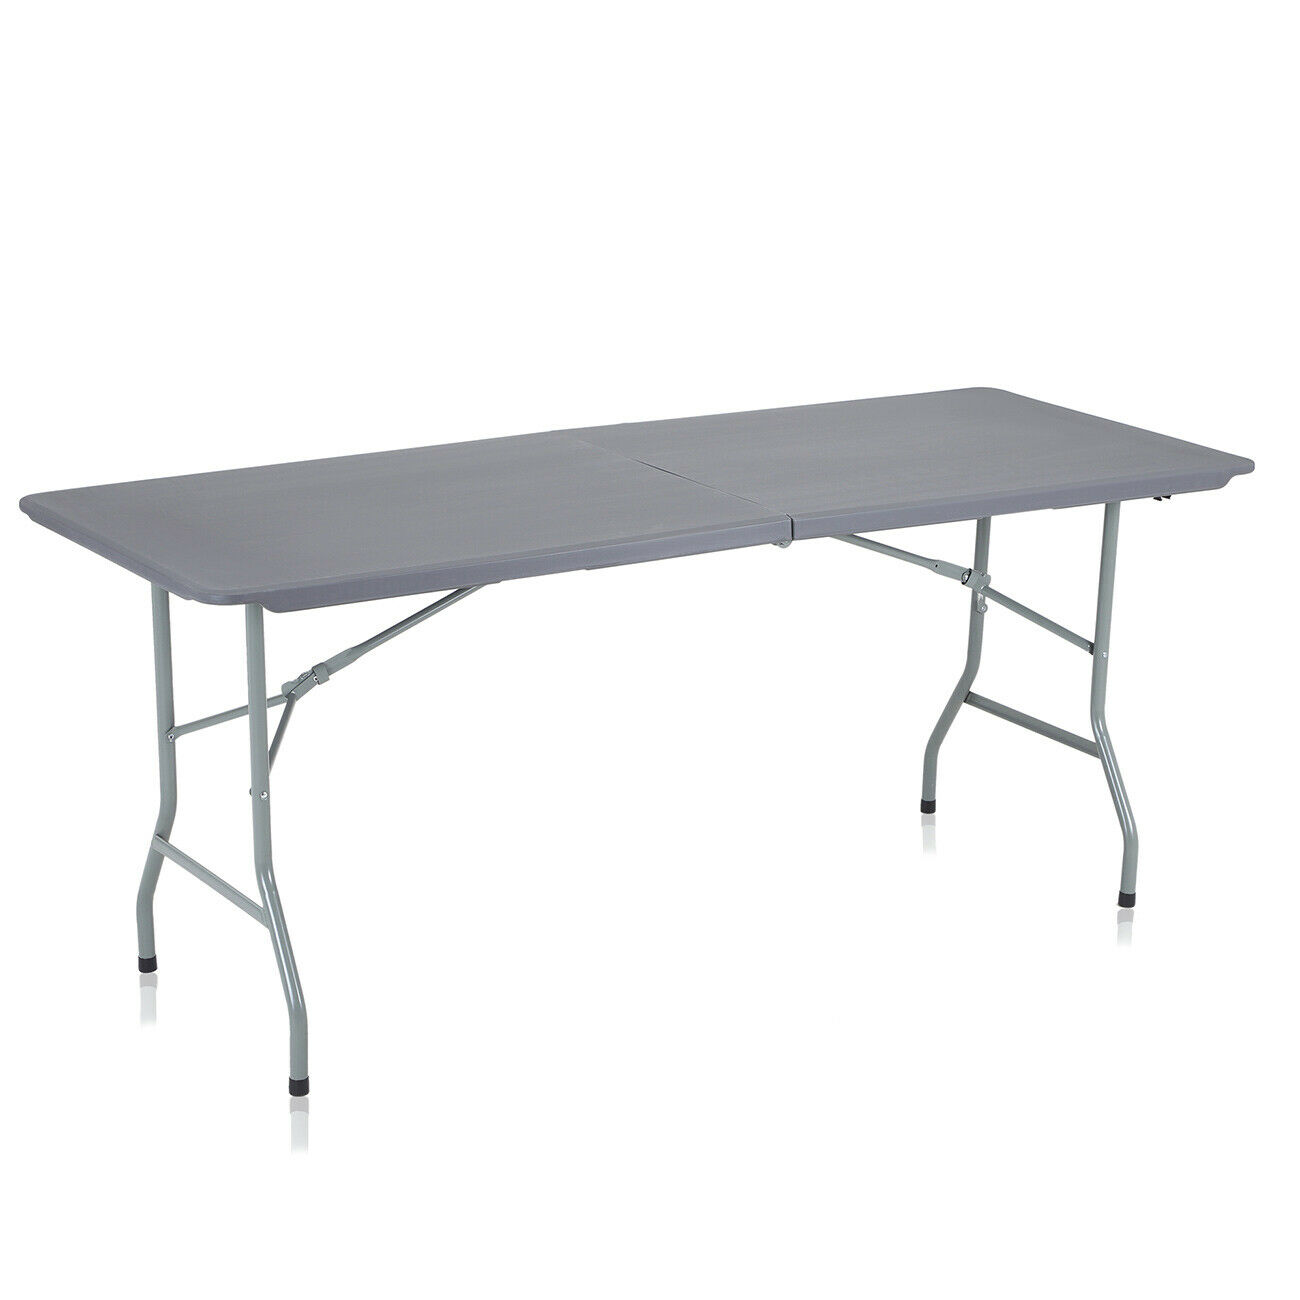 Jardín mesa de Cámping mesa mesa de comedor mesa  de bufé mesa plegable gris oscuro strattore  precio razonable